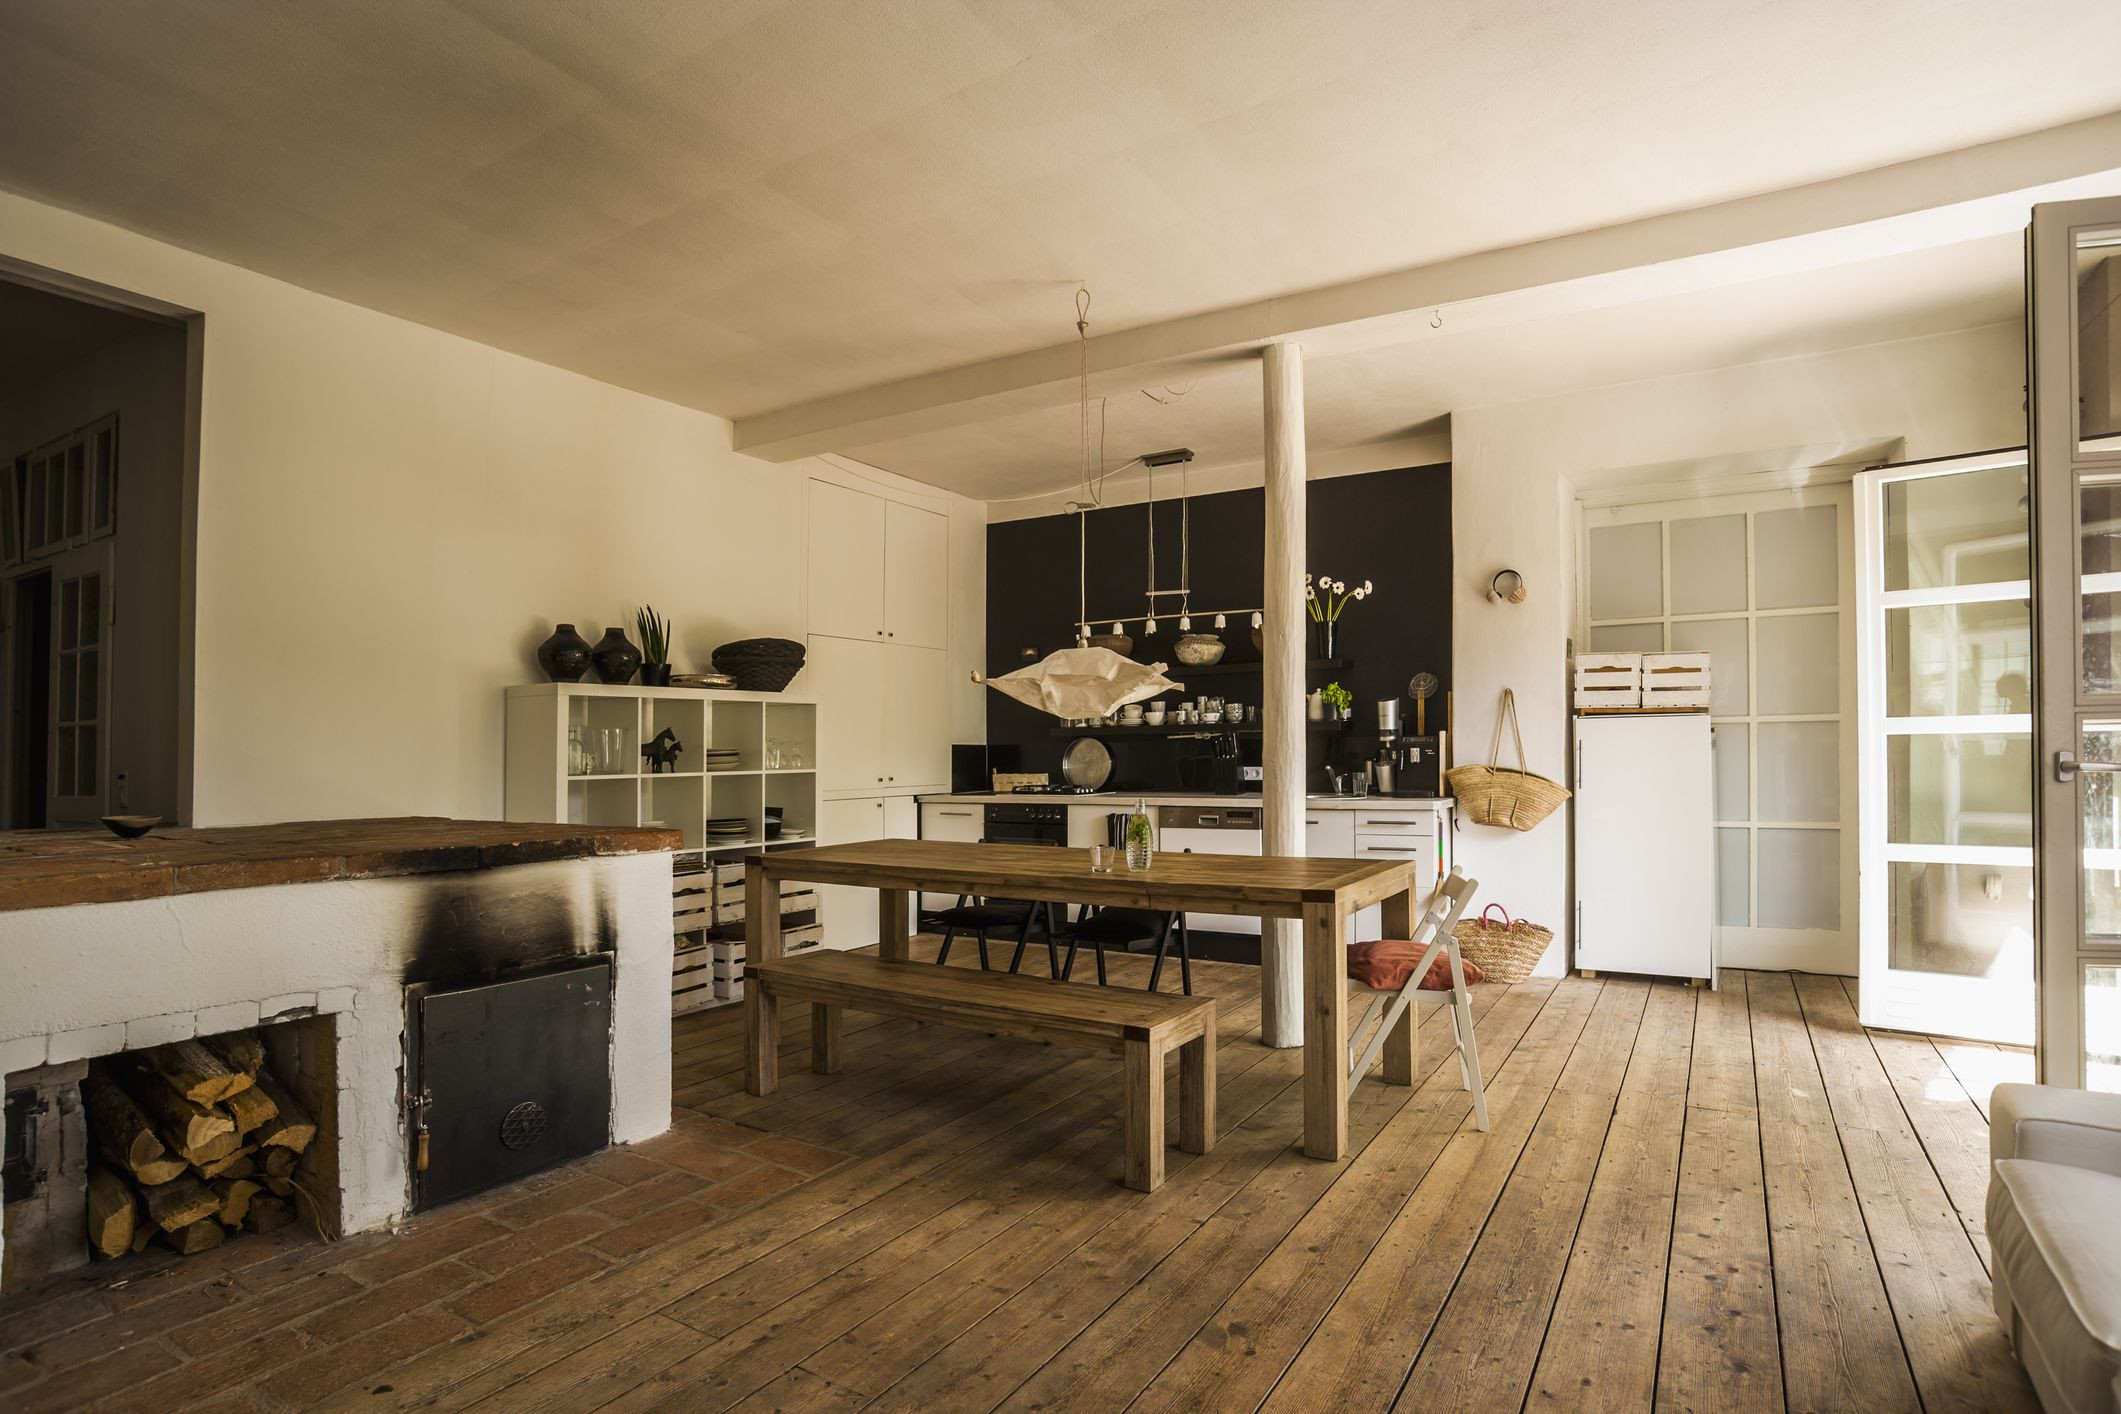 2 different hardwood floors of vinyl wood flooring versus natural hardwood for diningroom woodenfloor gettyimages 544546775 590e57565f9b58647043440a